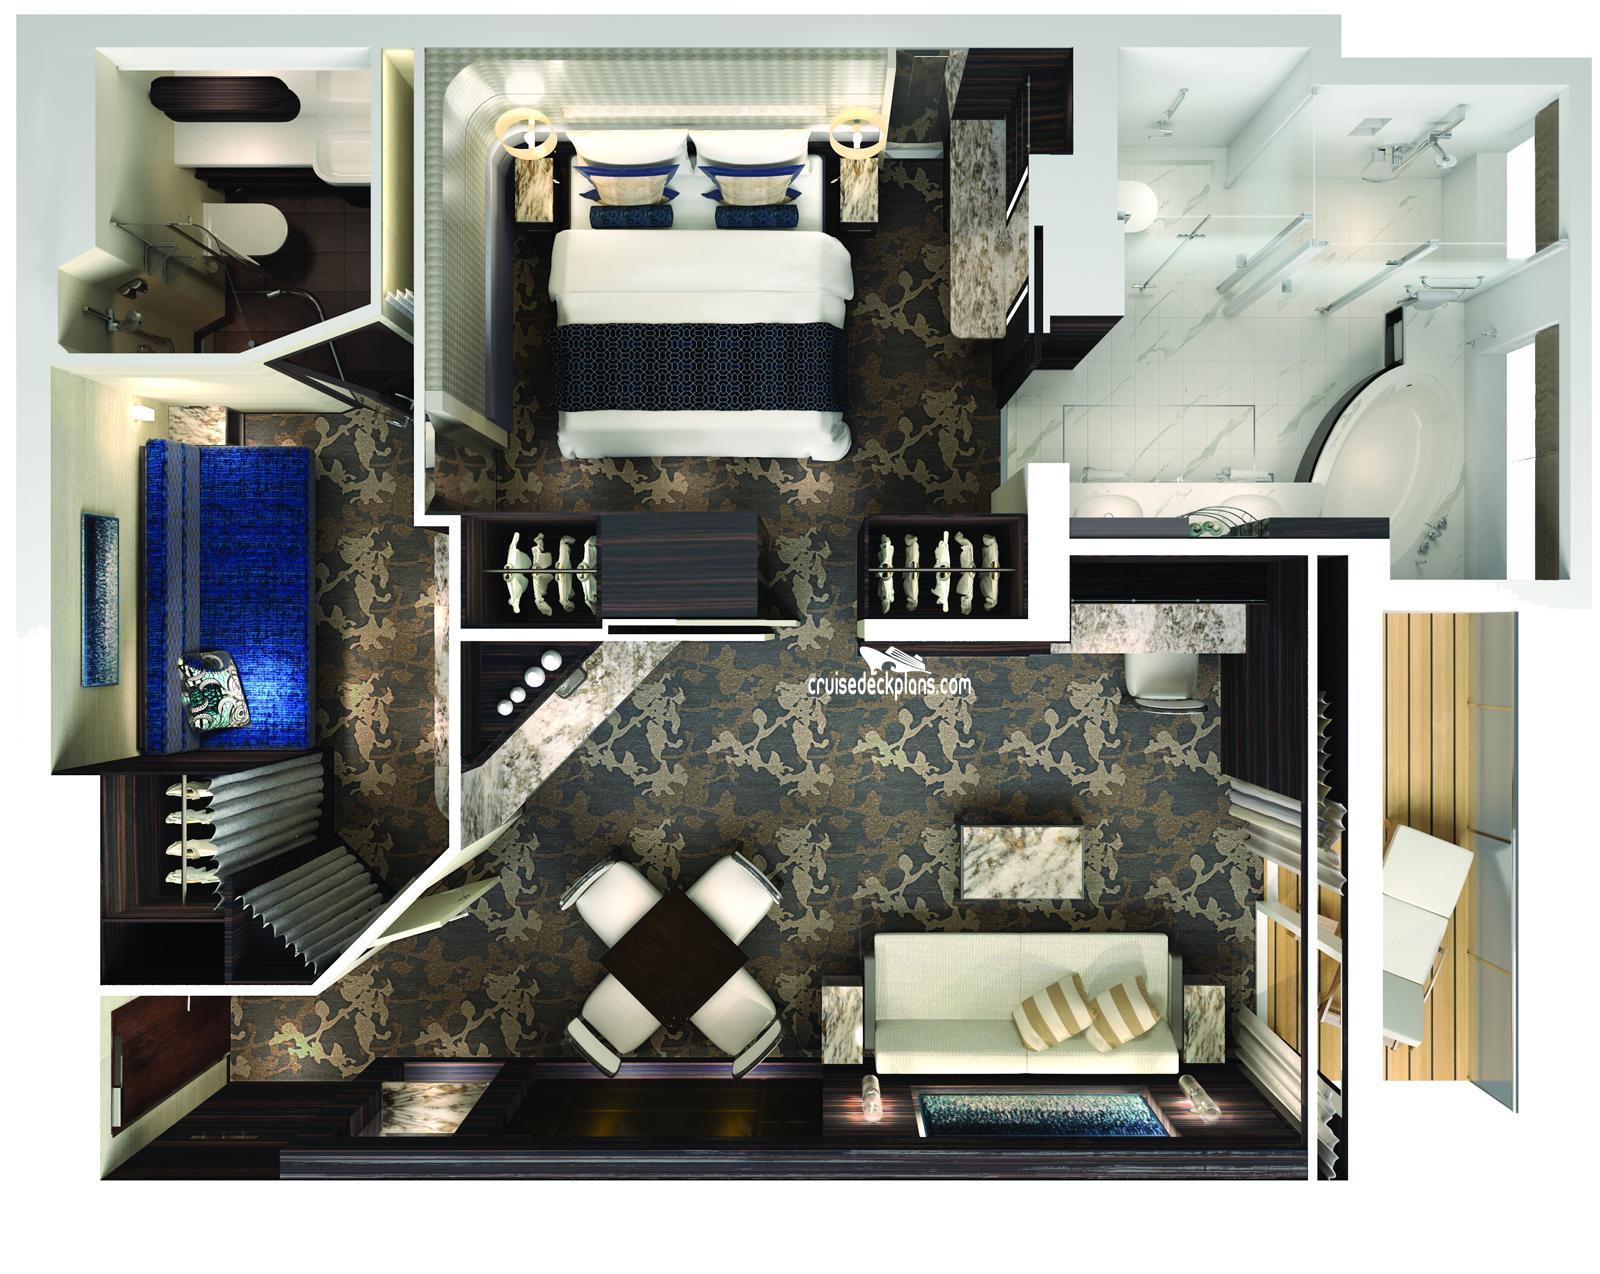 Norwegian Bliss The Haven 2 Bedroom Family Villa Stateroom